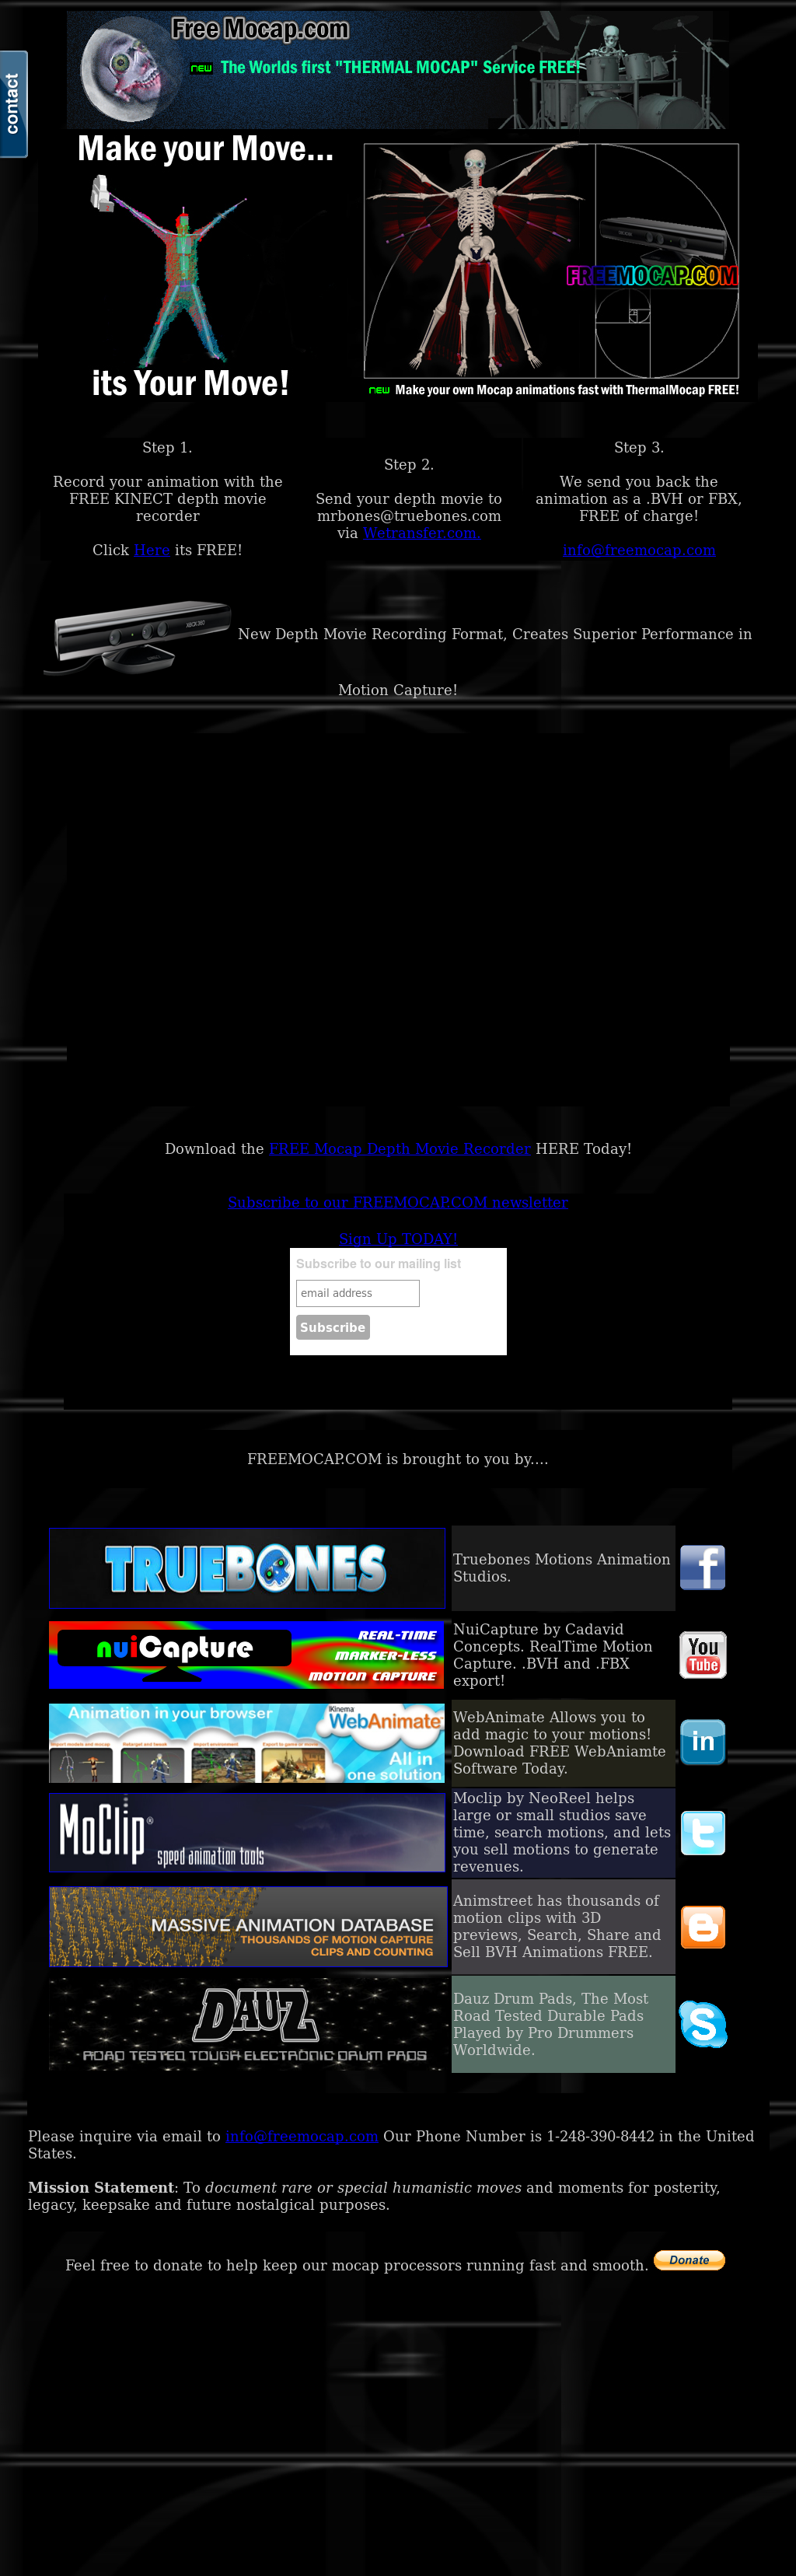 Truebones Motions Competitors, Revenue and Employees - Owler Company